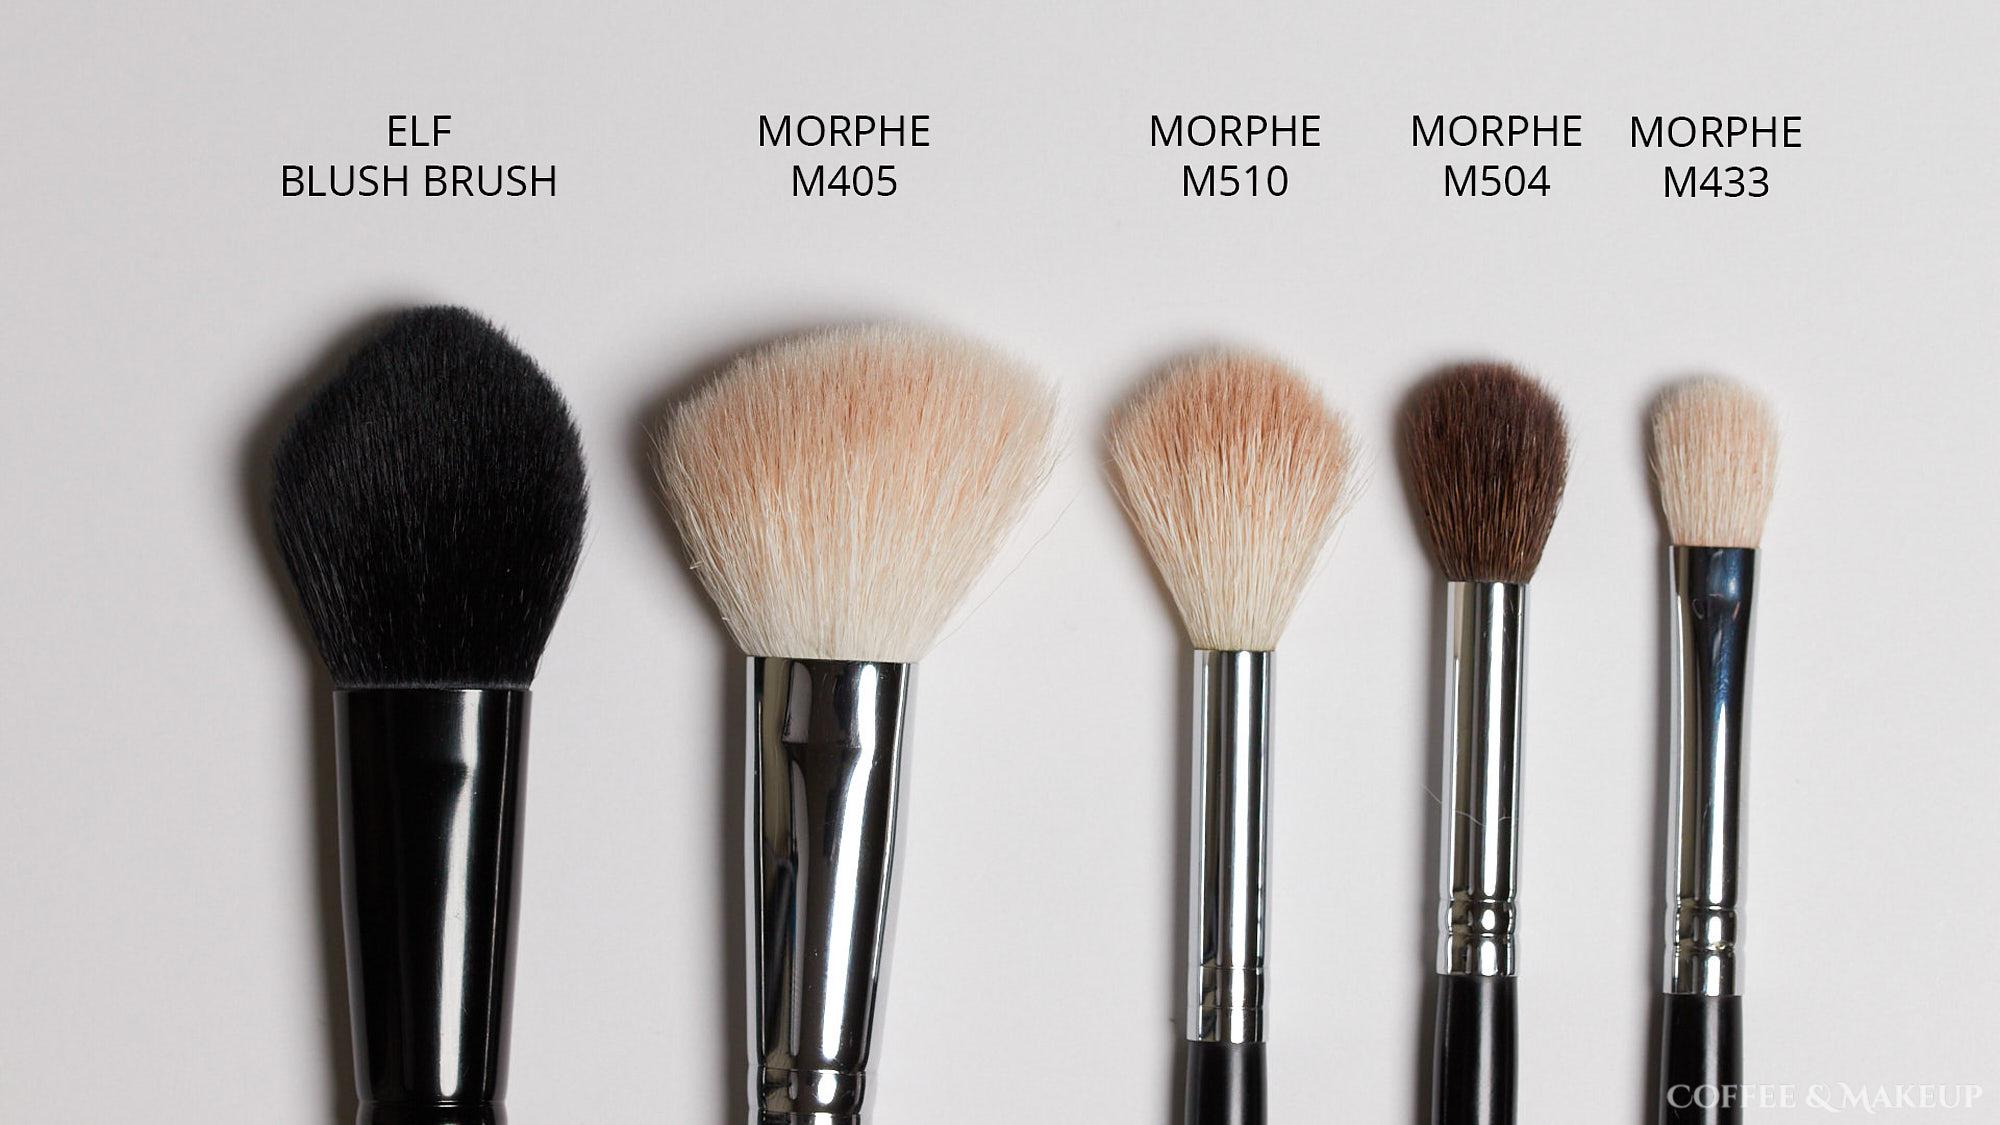 Elf Blush Brush, Morphe M405, Morphe M510, Morphe M504, Morphe M433